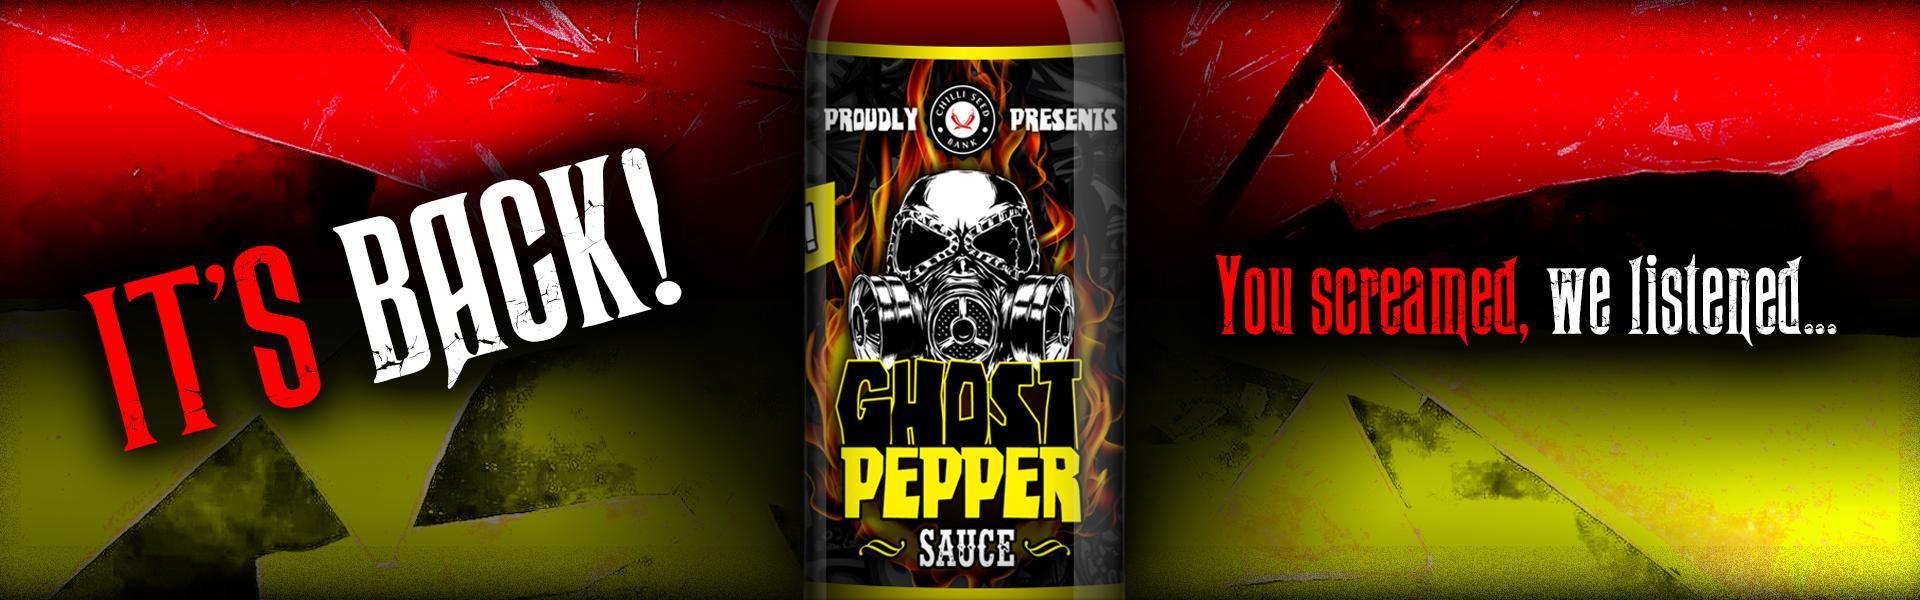 Buy Ghost Pepper Sauce